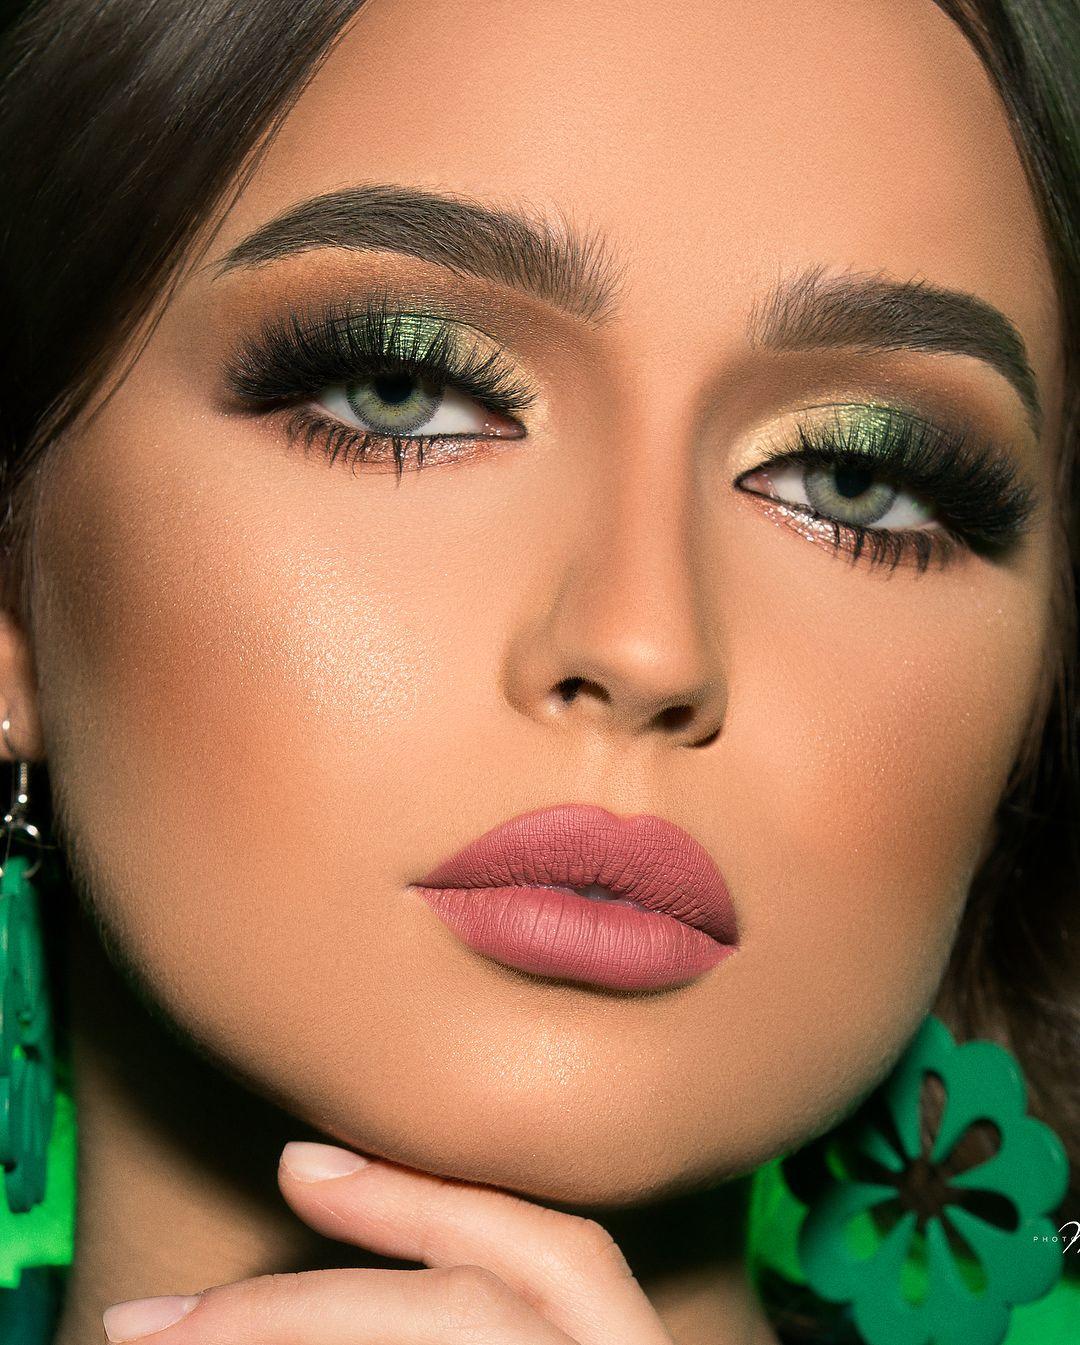 من اللوكات الفائزة بمسابقة نورة بوعوض بانامل الابداع كله Makeup Artist Jawaher مسابقة نوره بوعوض عربيه N Makeup Salon Gorgeous Makeup Eye Makeup